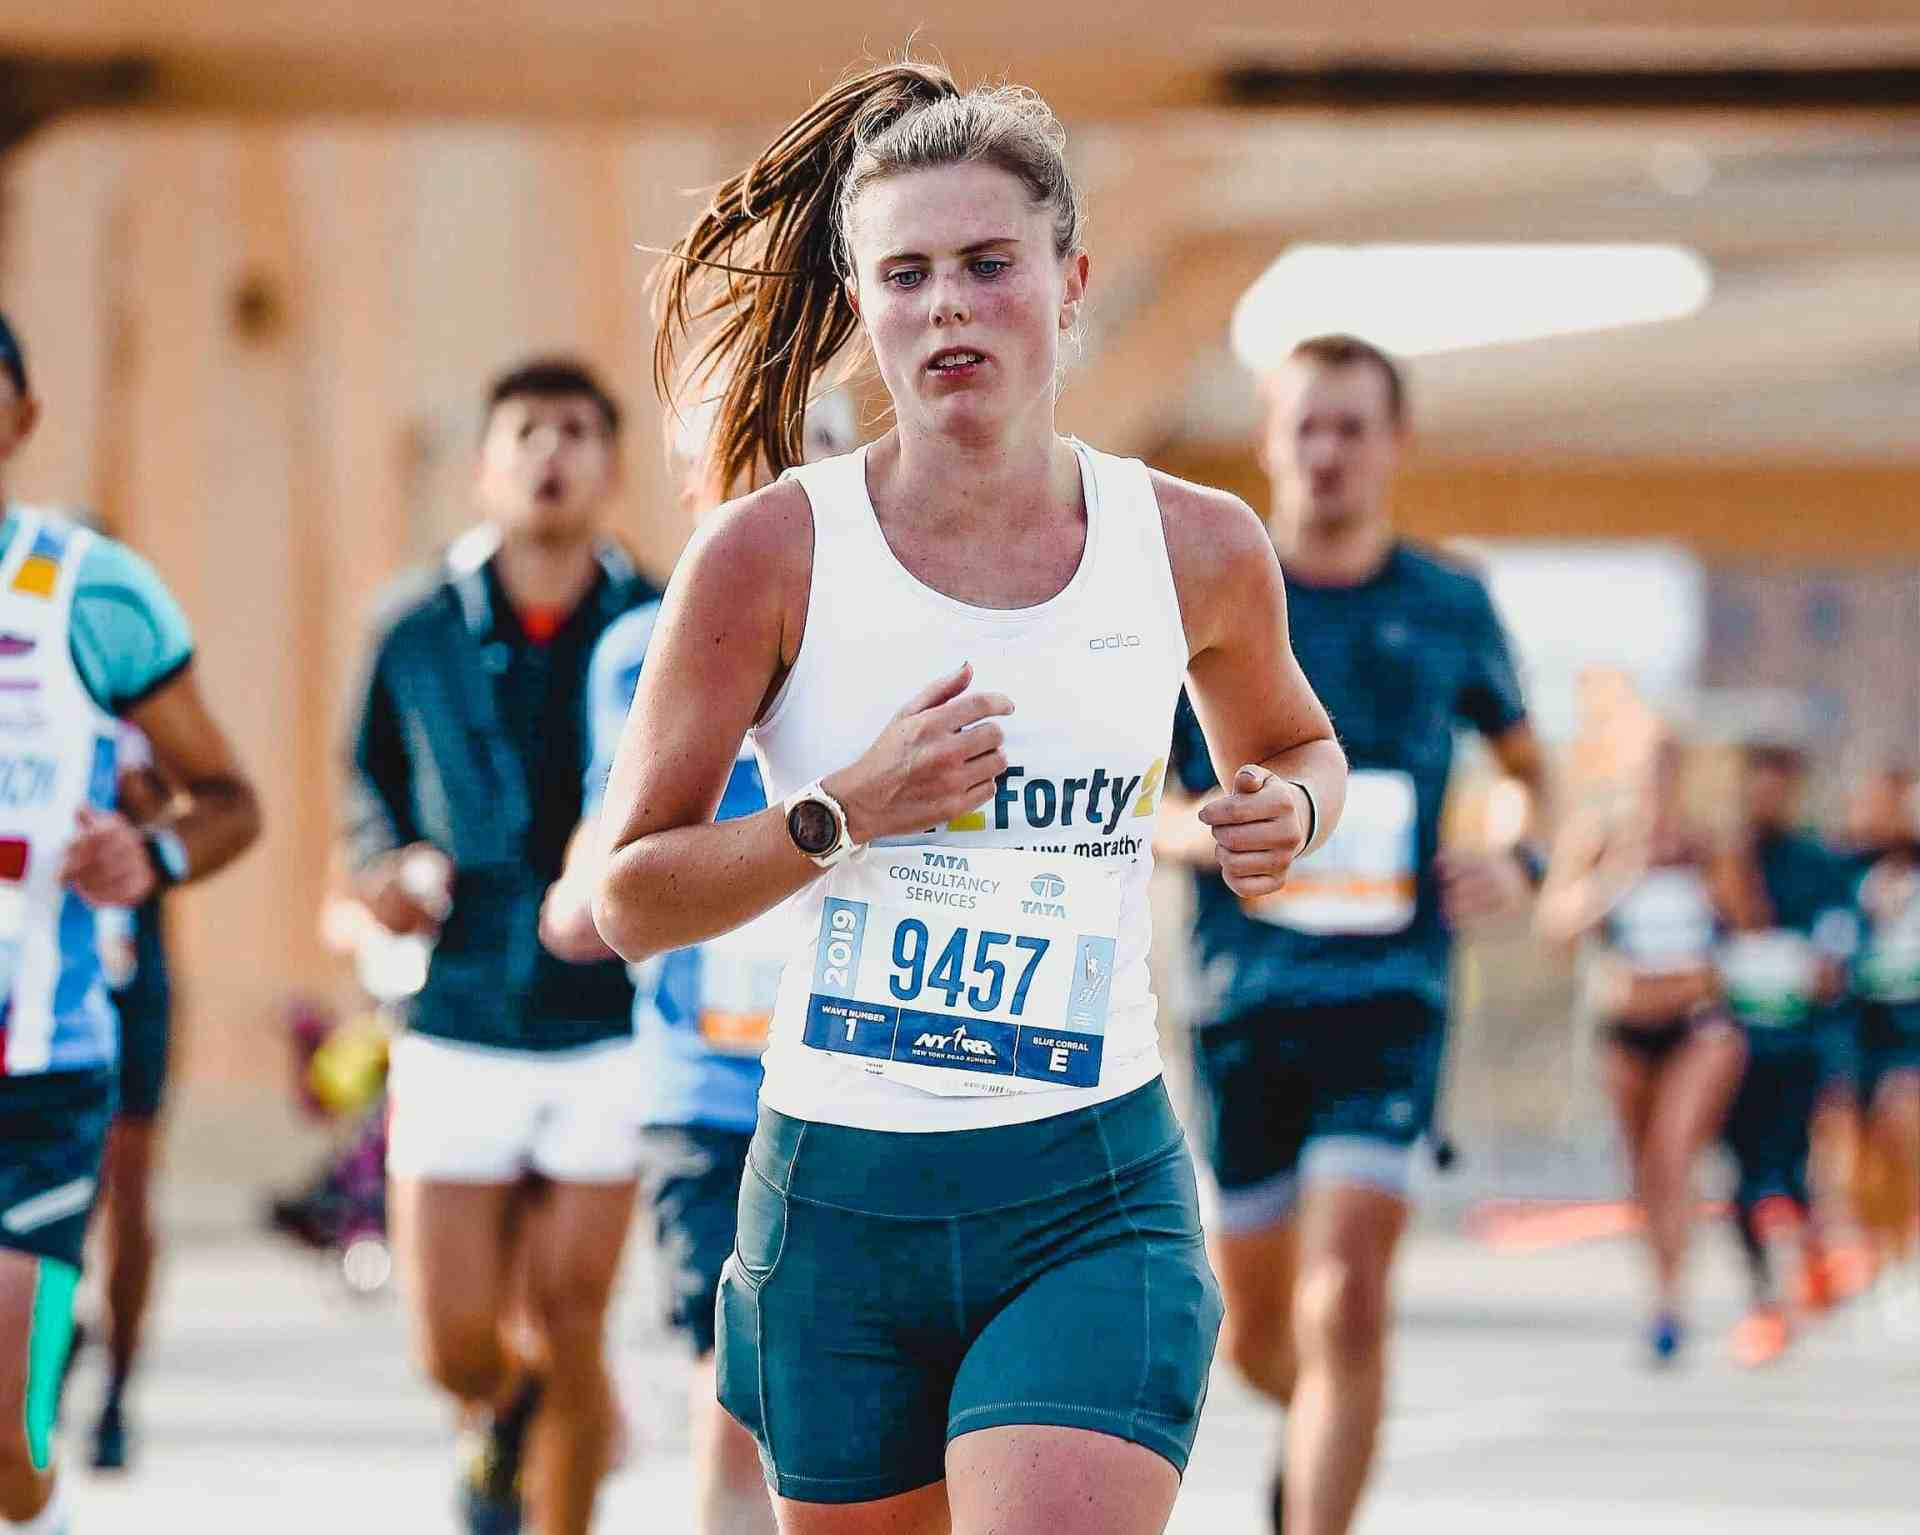 raceverslag new york marathon